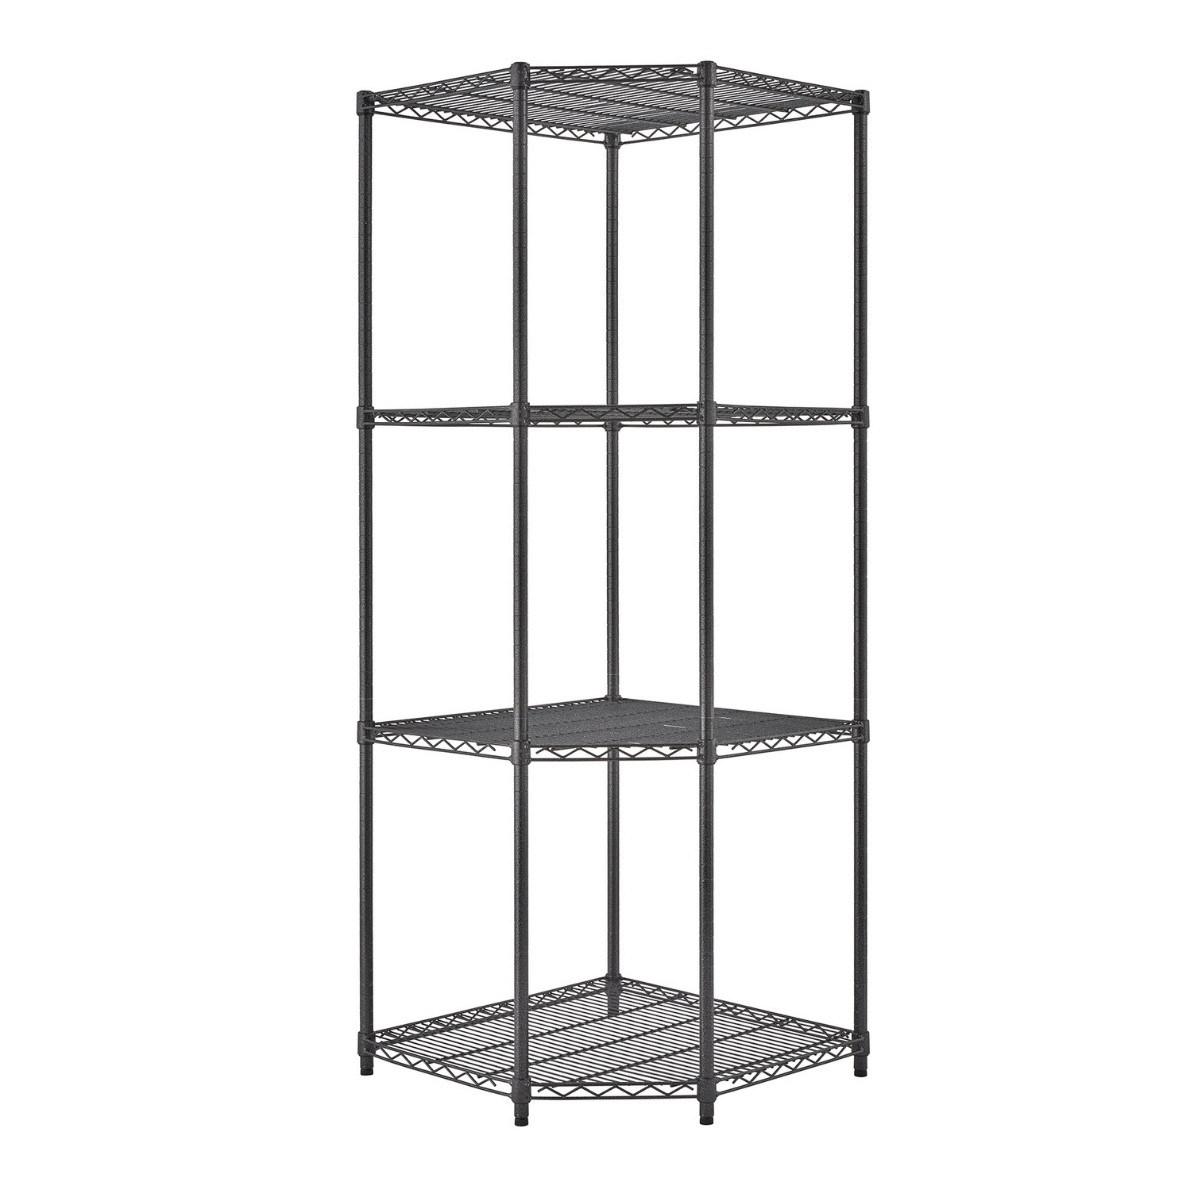 Hot Item Corner Shelf 4 Layers Adjustable Metal Storage Shelf Unit Food And Beverage Organization Wire Shelving Racks